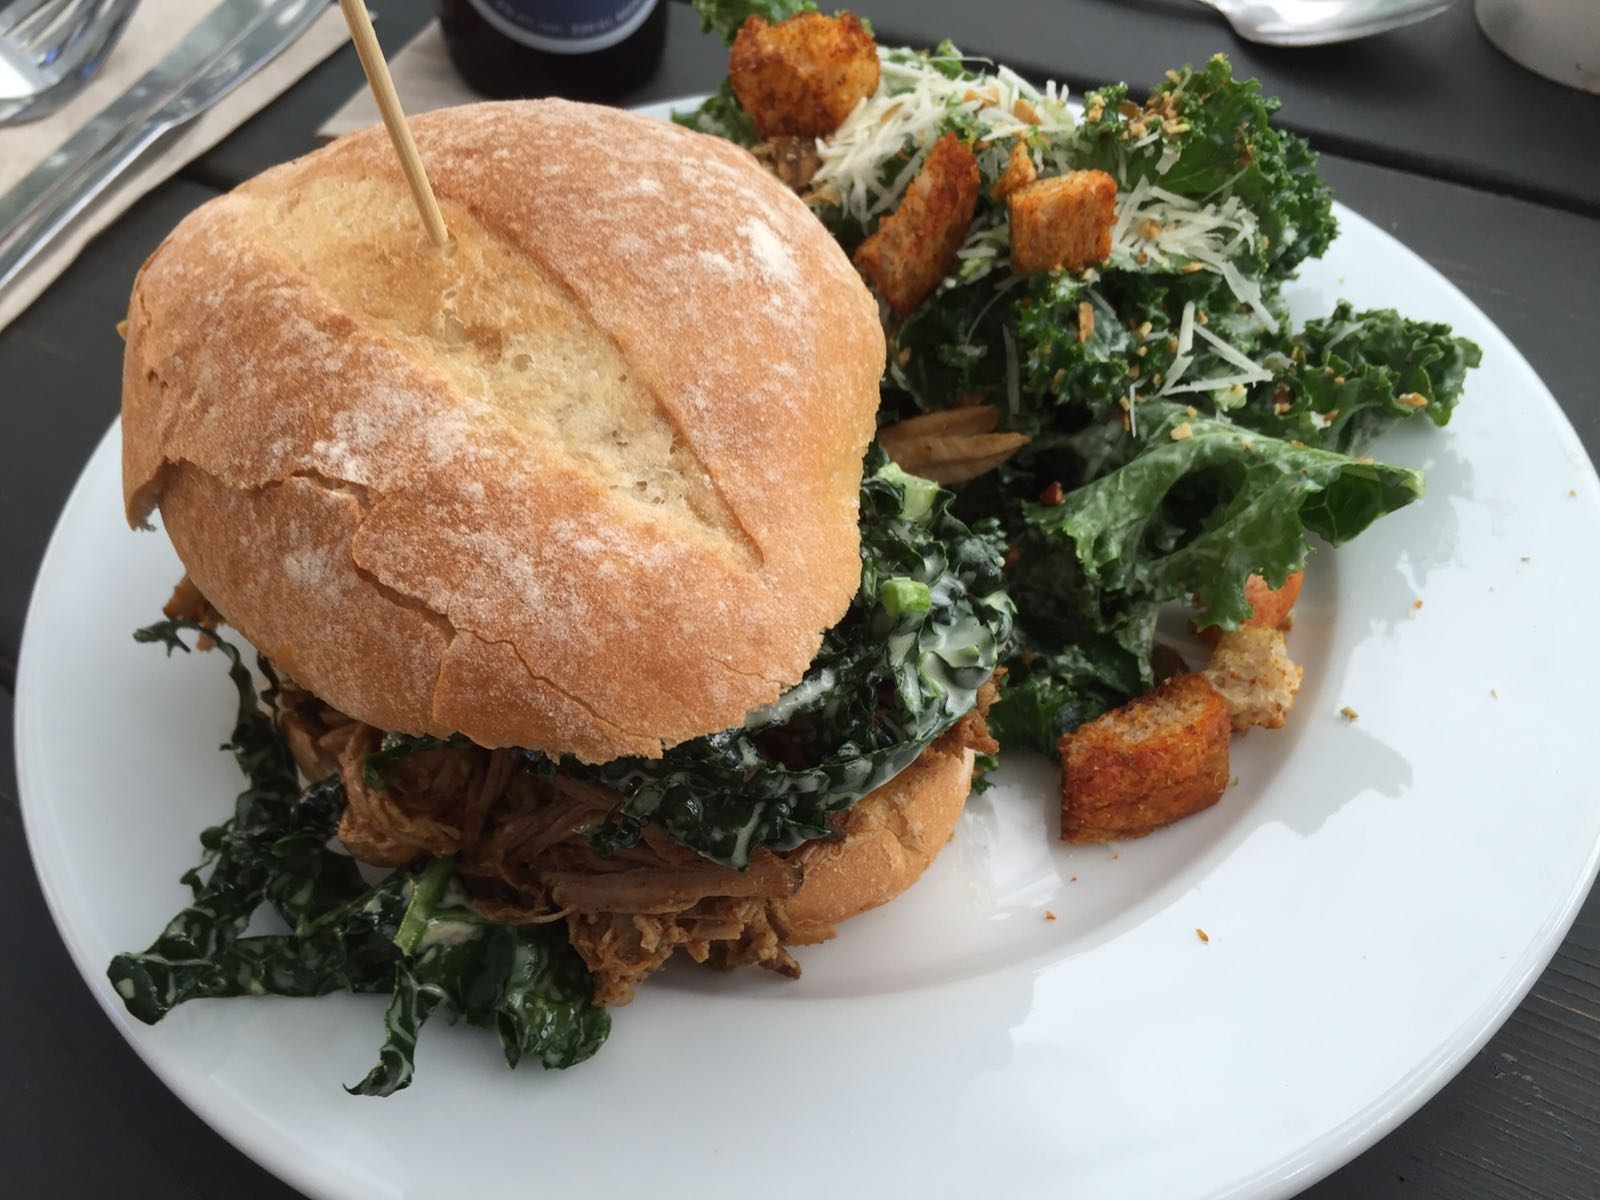 Pulled Pork Sandwich with Kale Caesar